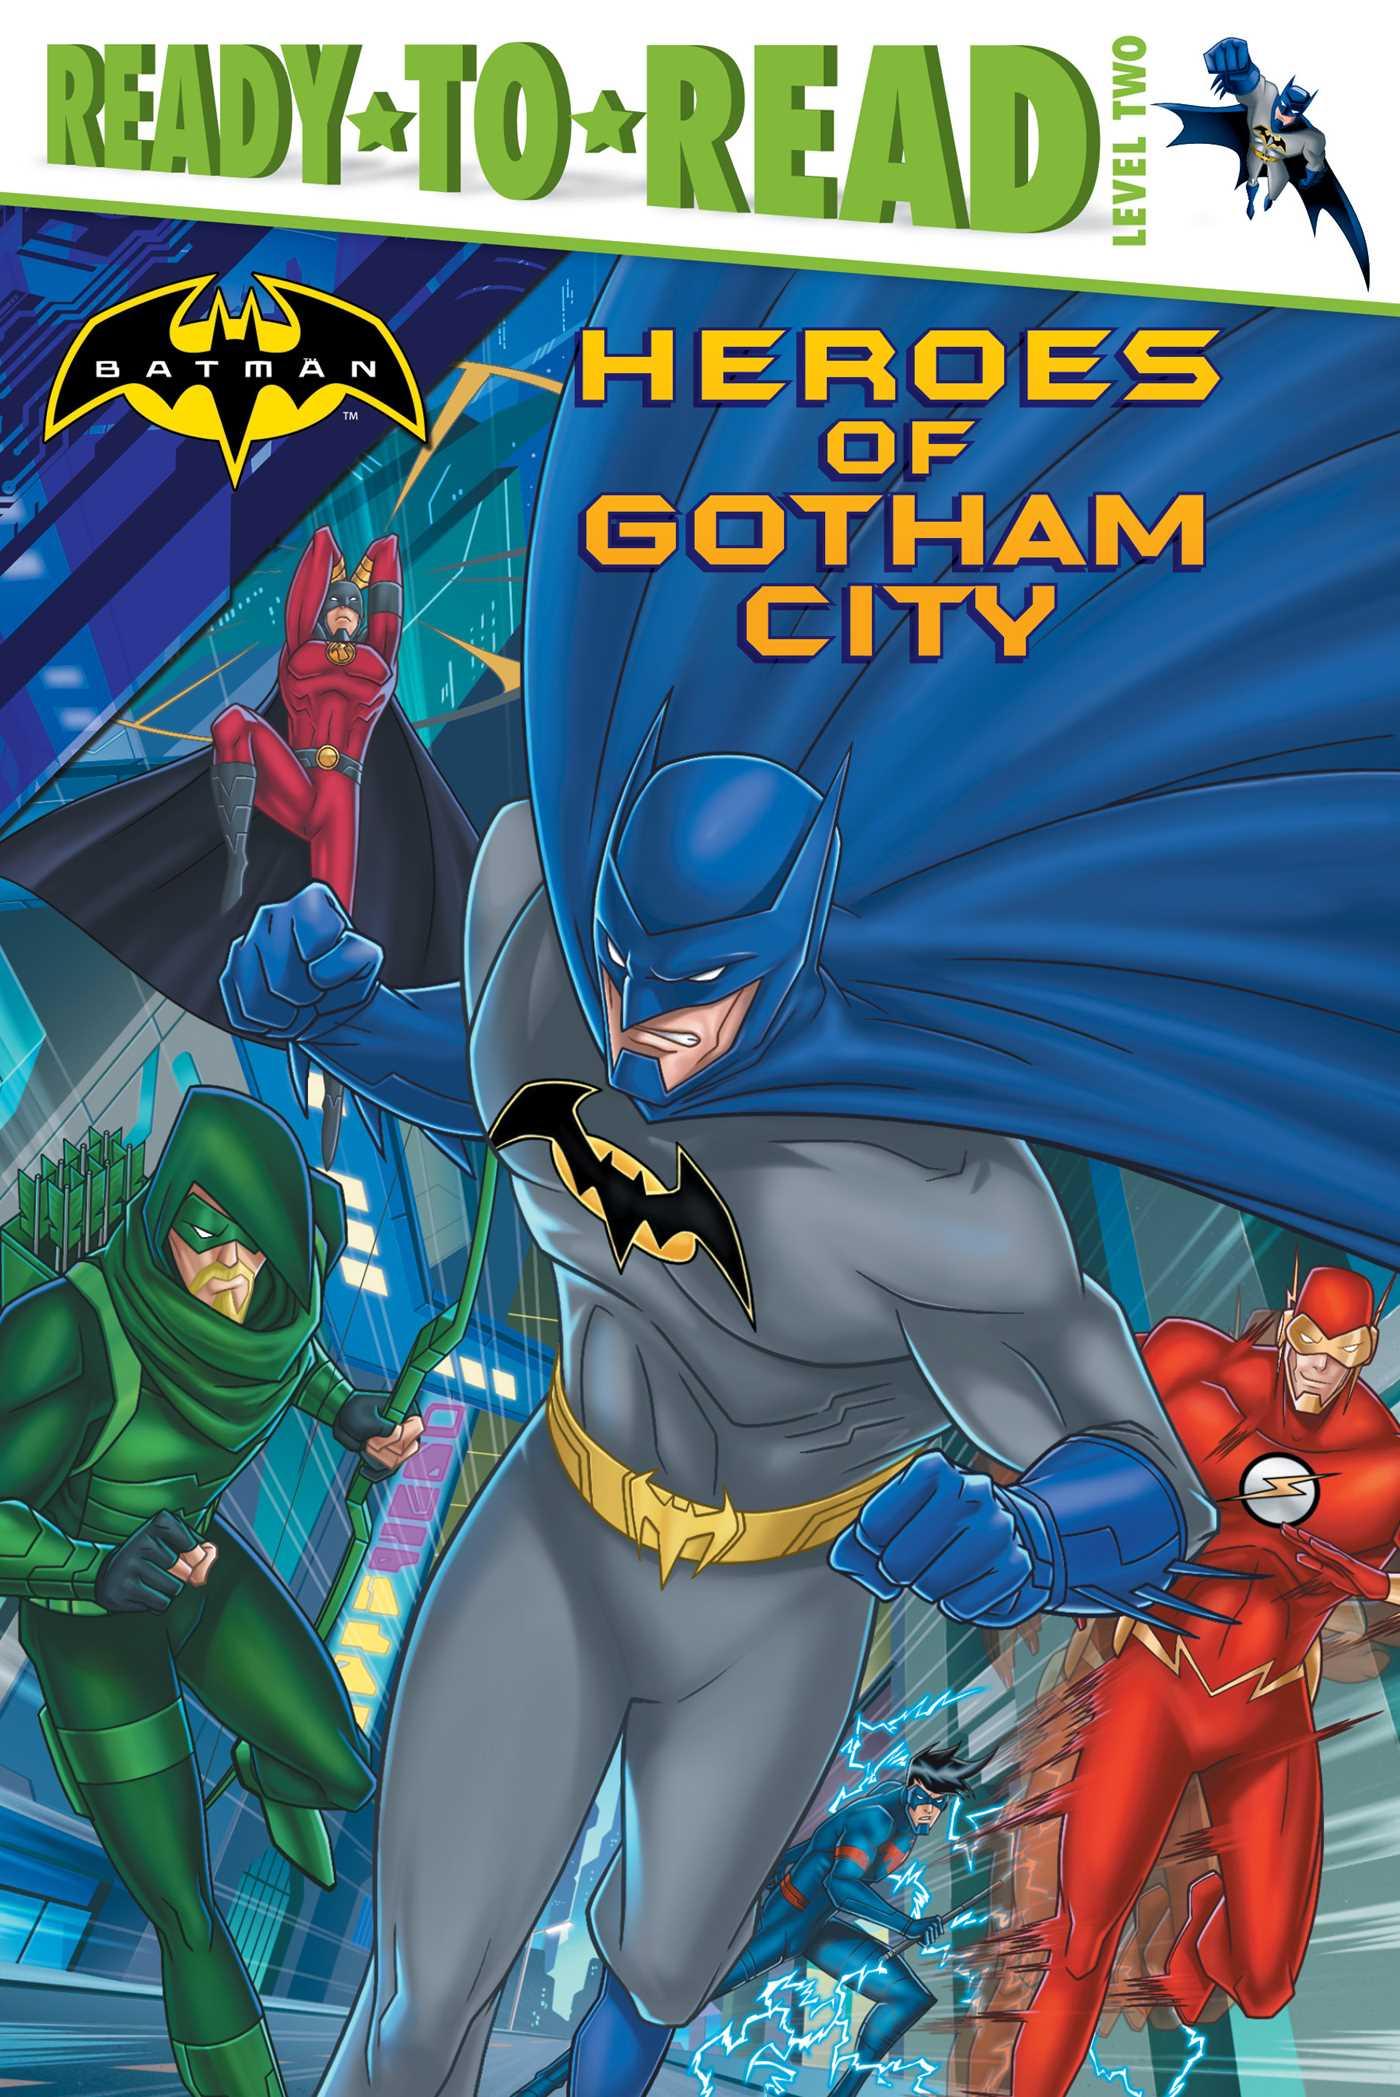 Heroes of gotham city 9781481477215 hr